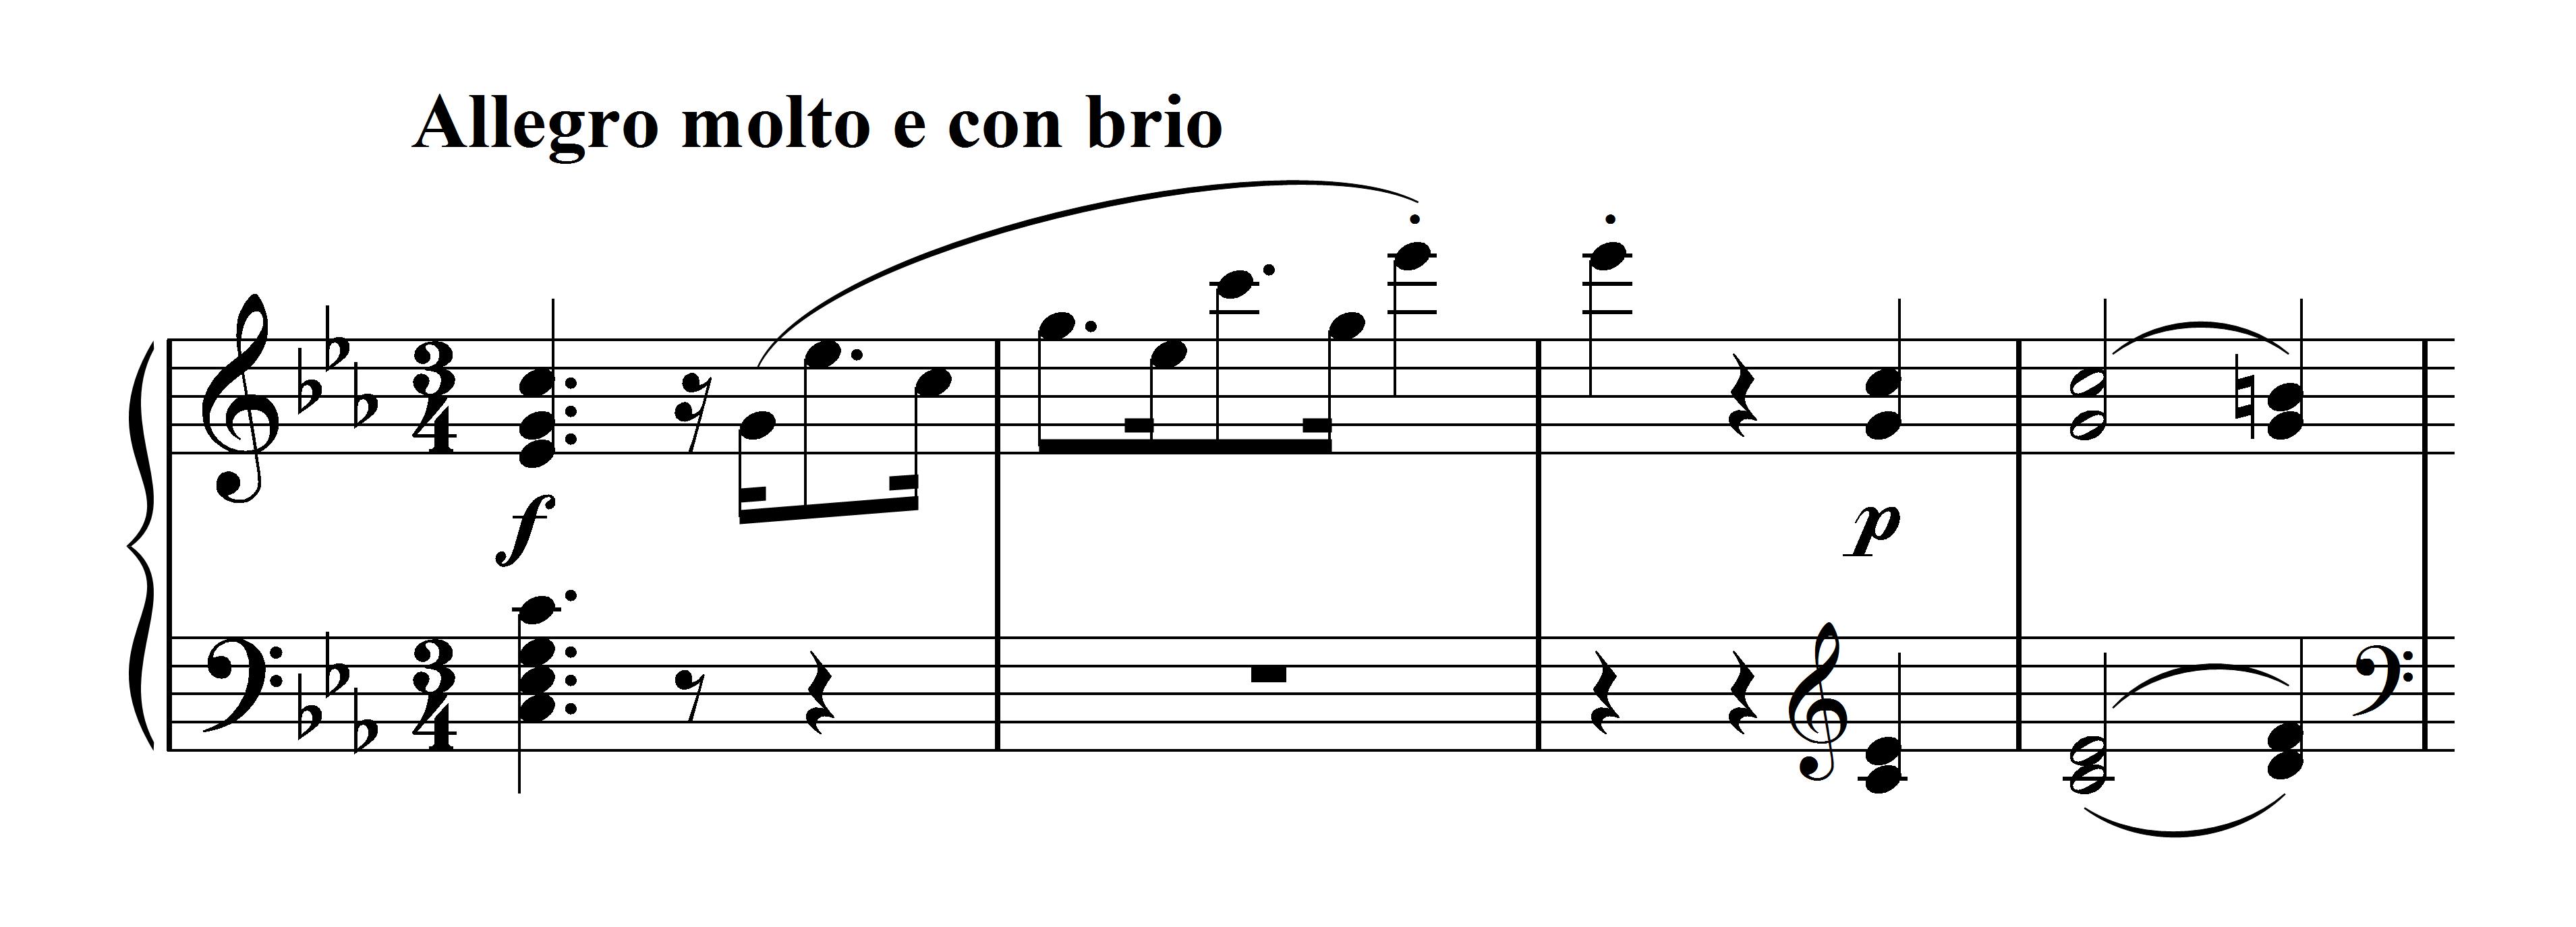 Piano Sonata No  5 (Beethoven) - Wikipedia